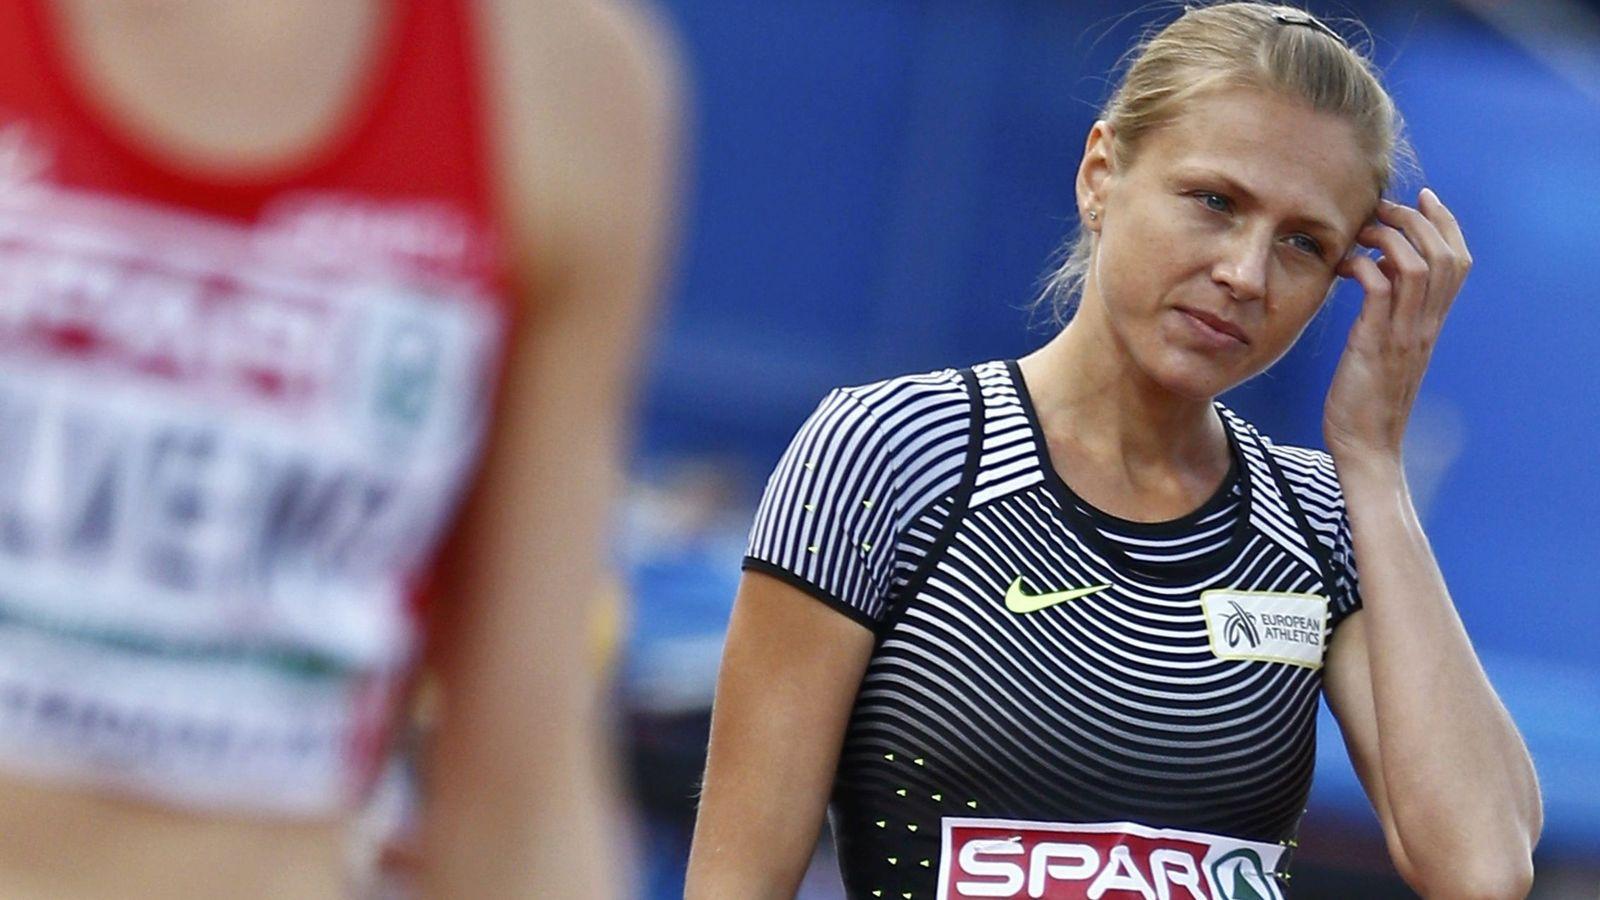 Foto: Yulia Stepanova en el Campeonato Europeo. Foto: Michael Kooren (Reuters)